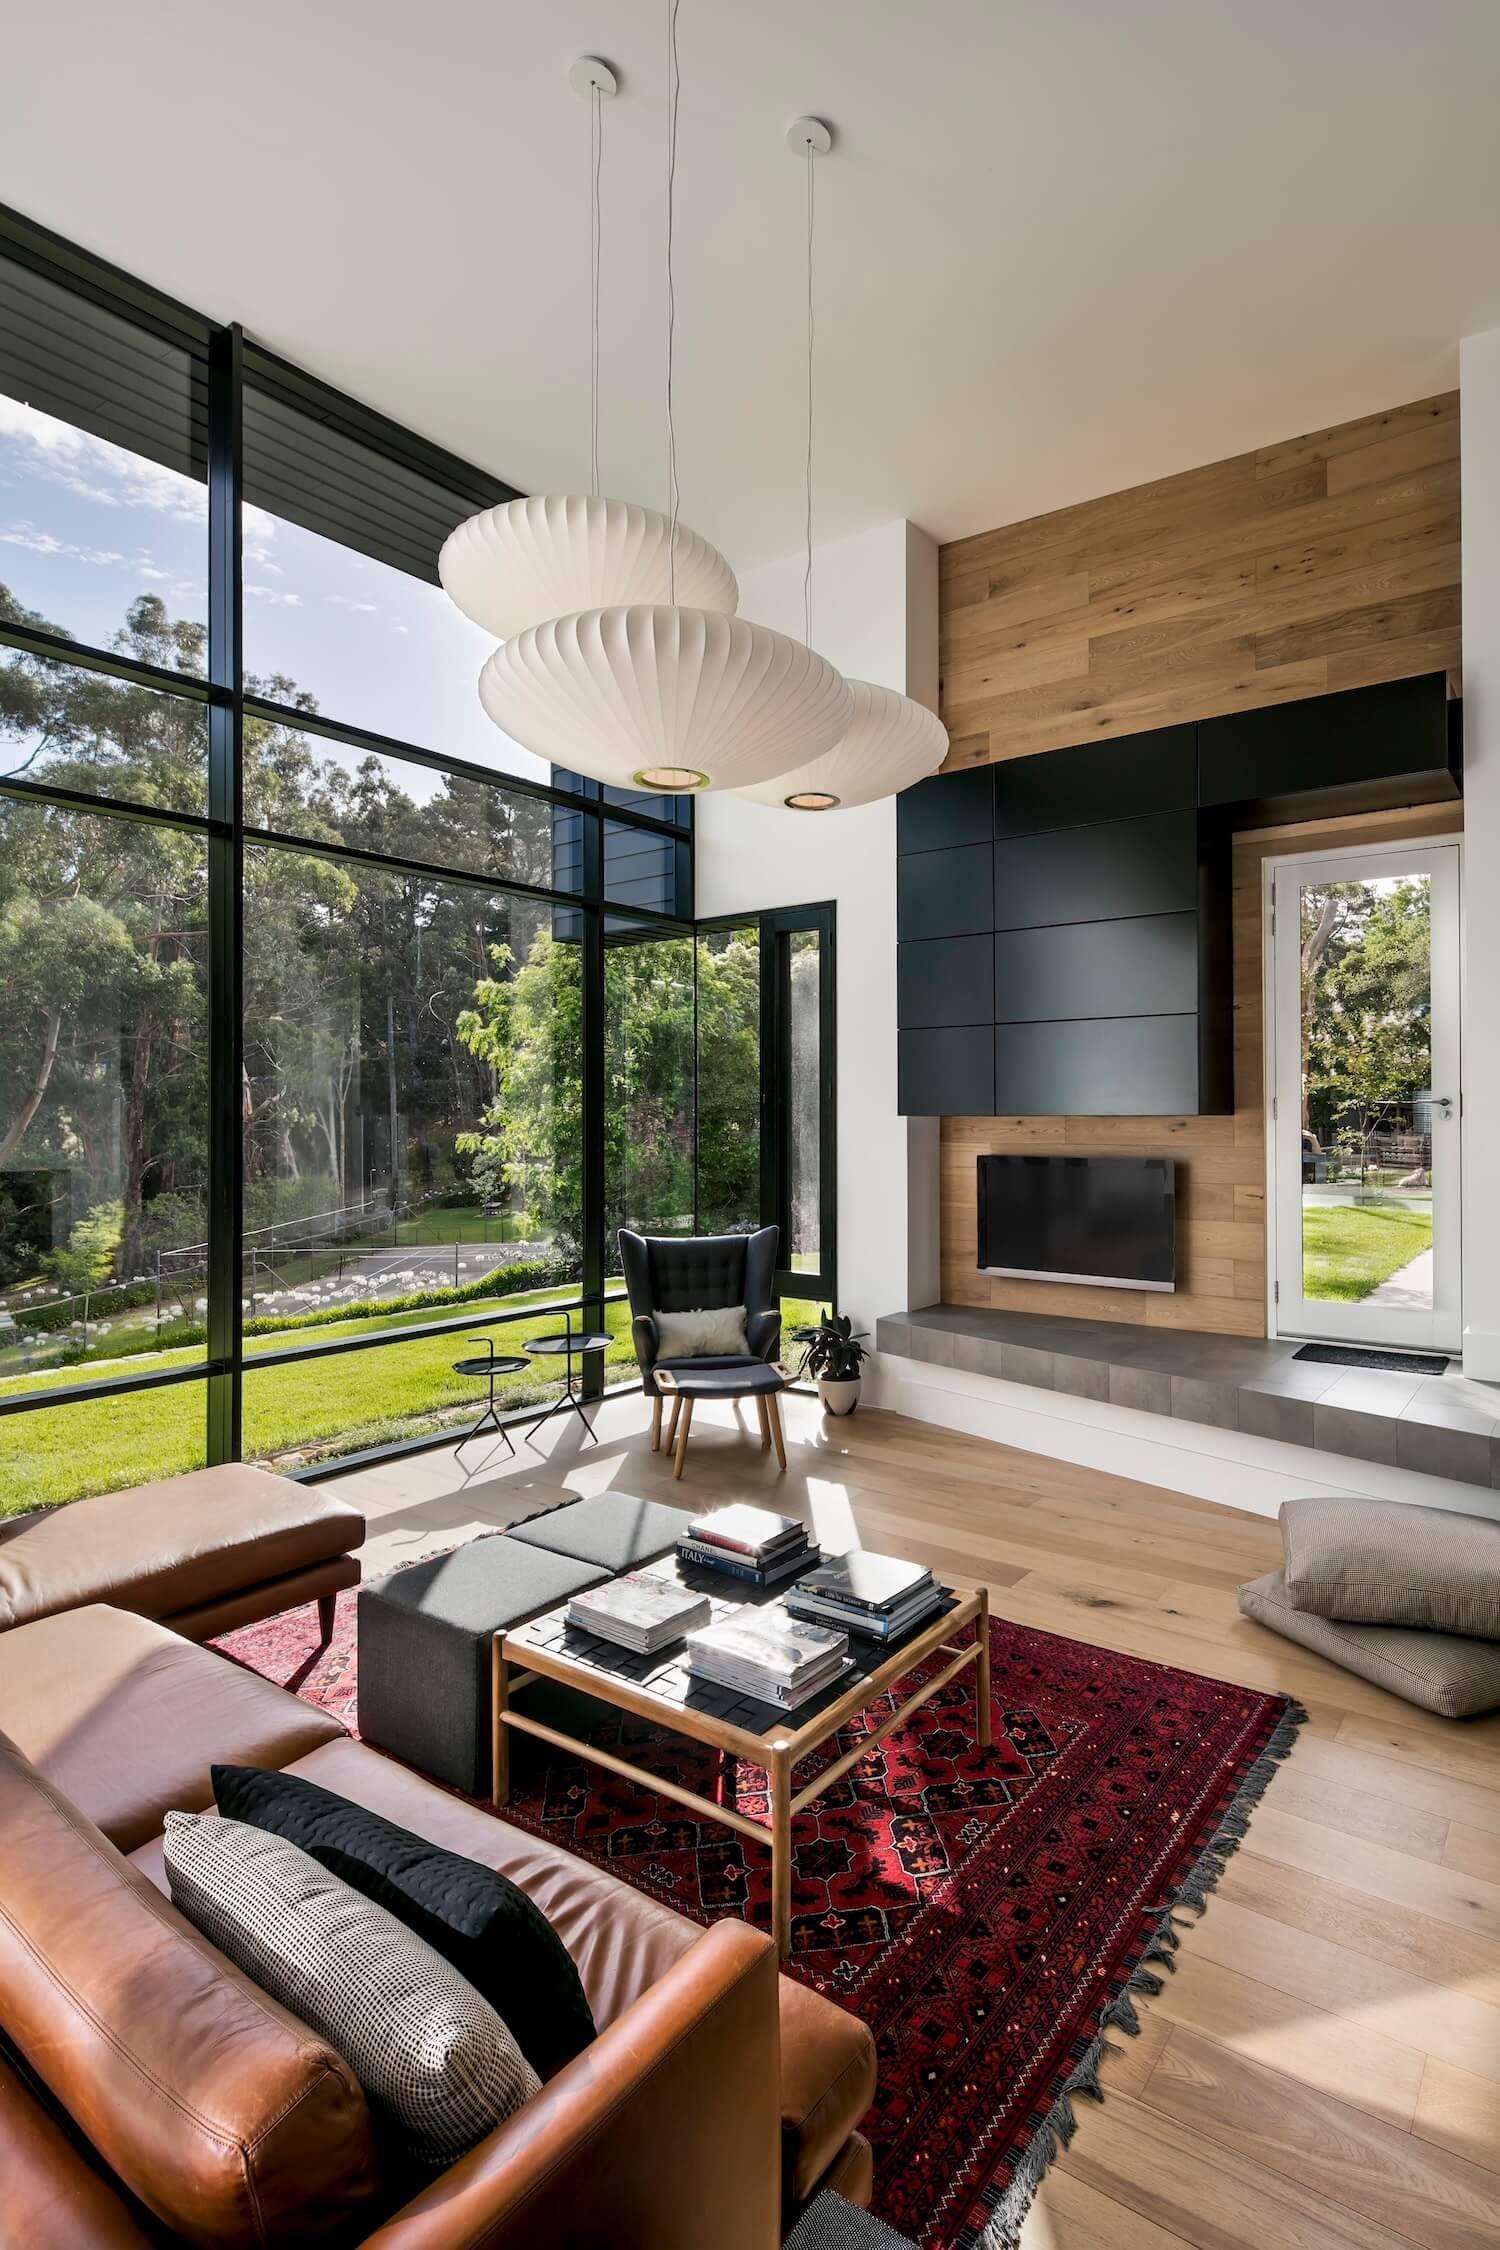 15 Inexpensive Attic Rooms Living Area Ideas Apartment Interior Attic Design Apartment Living Room